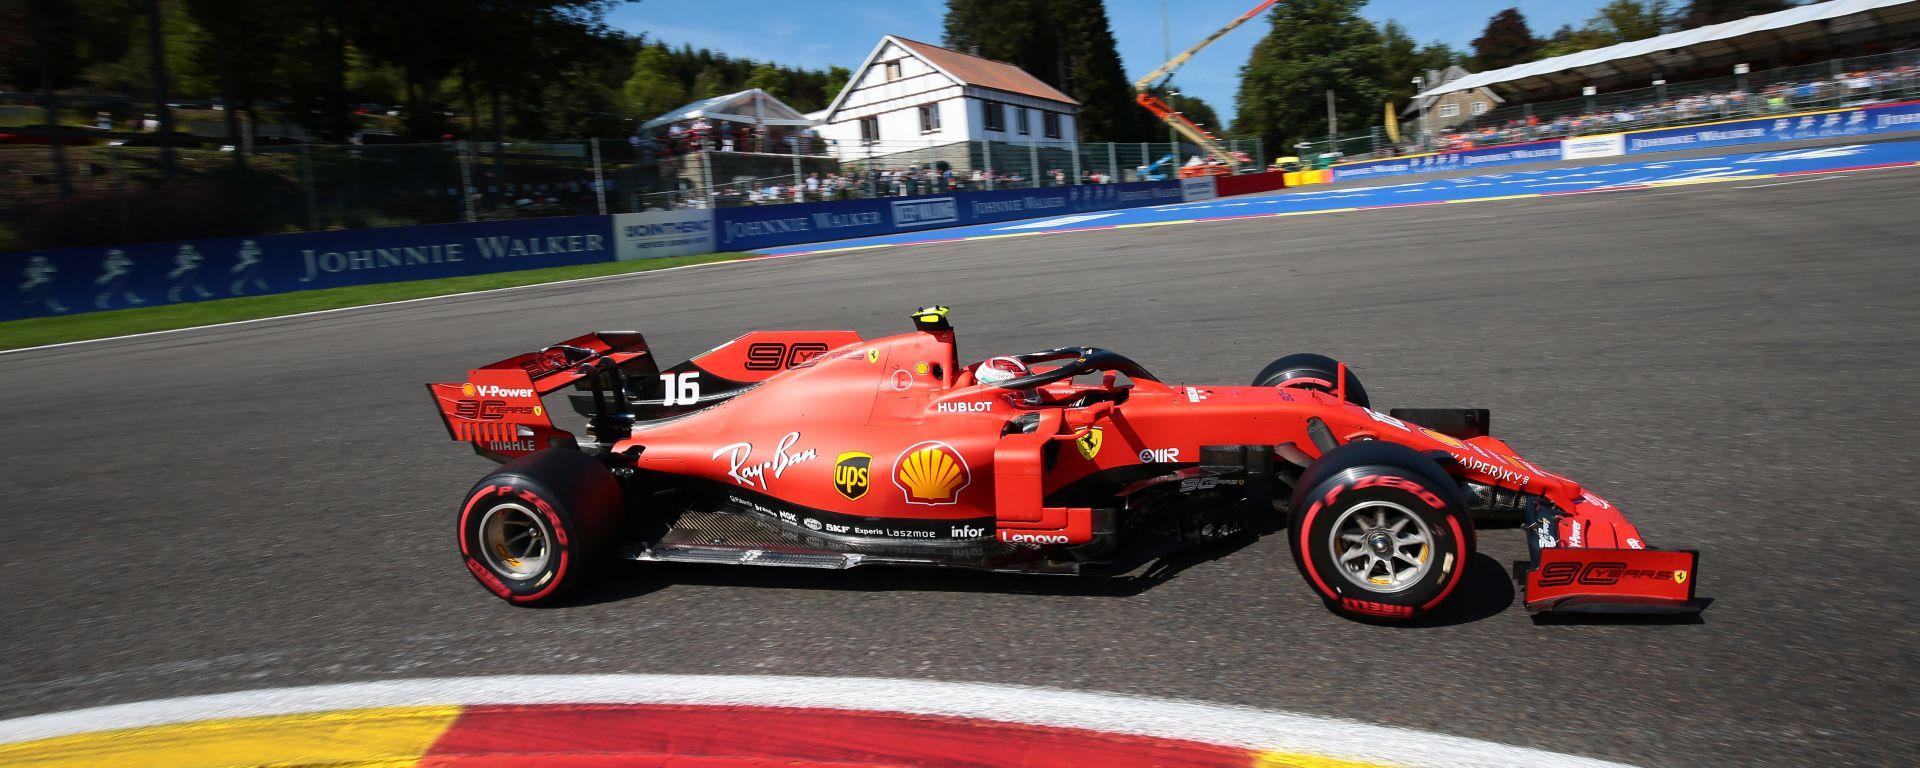 F1 GP Belgio 2019, Spa-Francorchamps, Charles Leclerc (Ferrari)